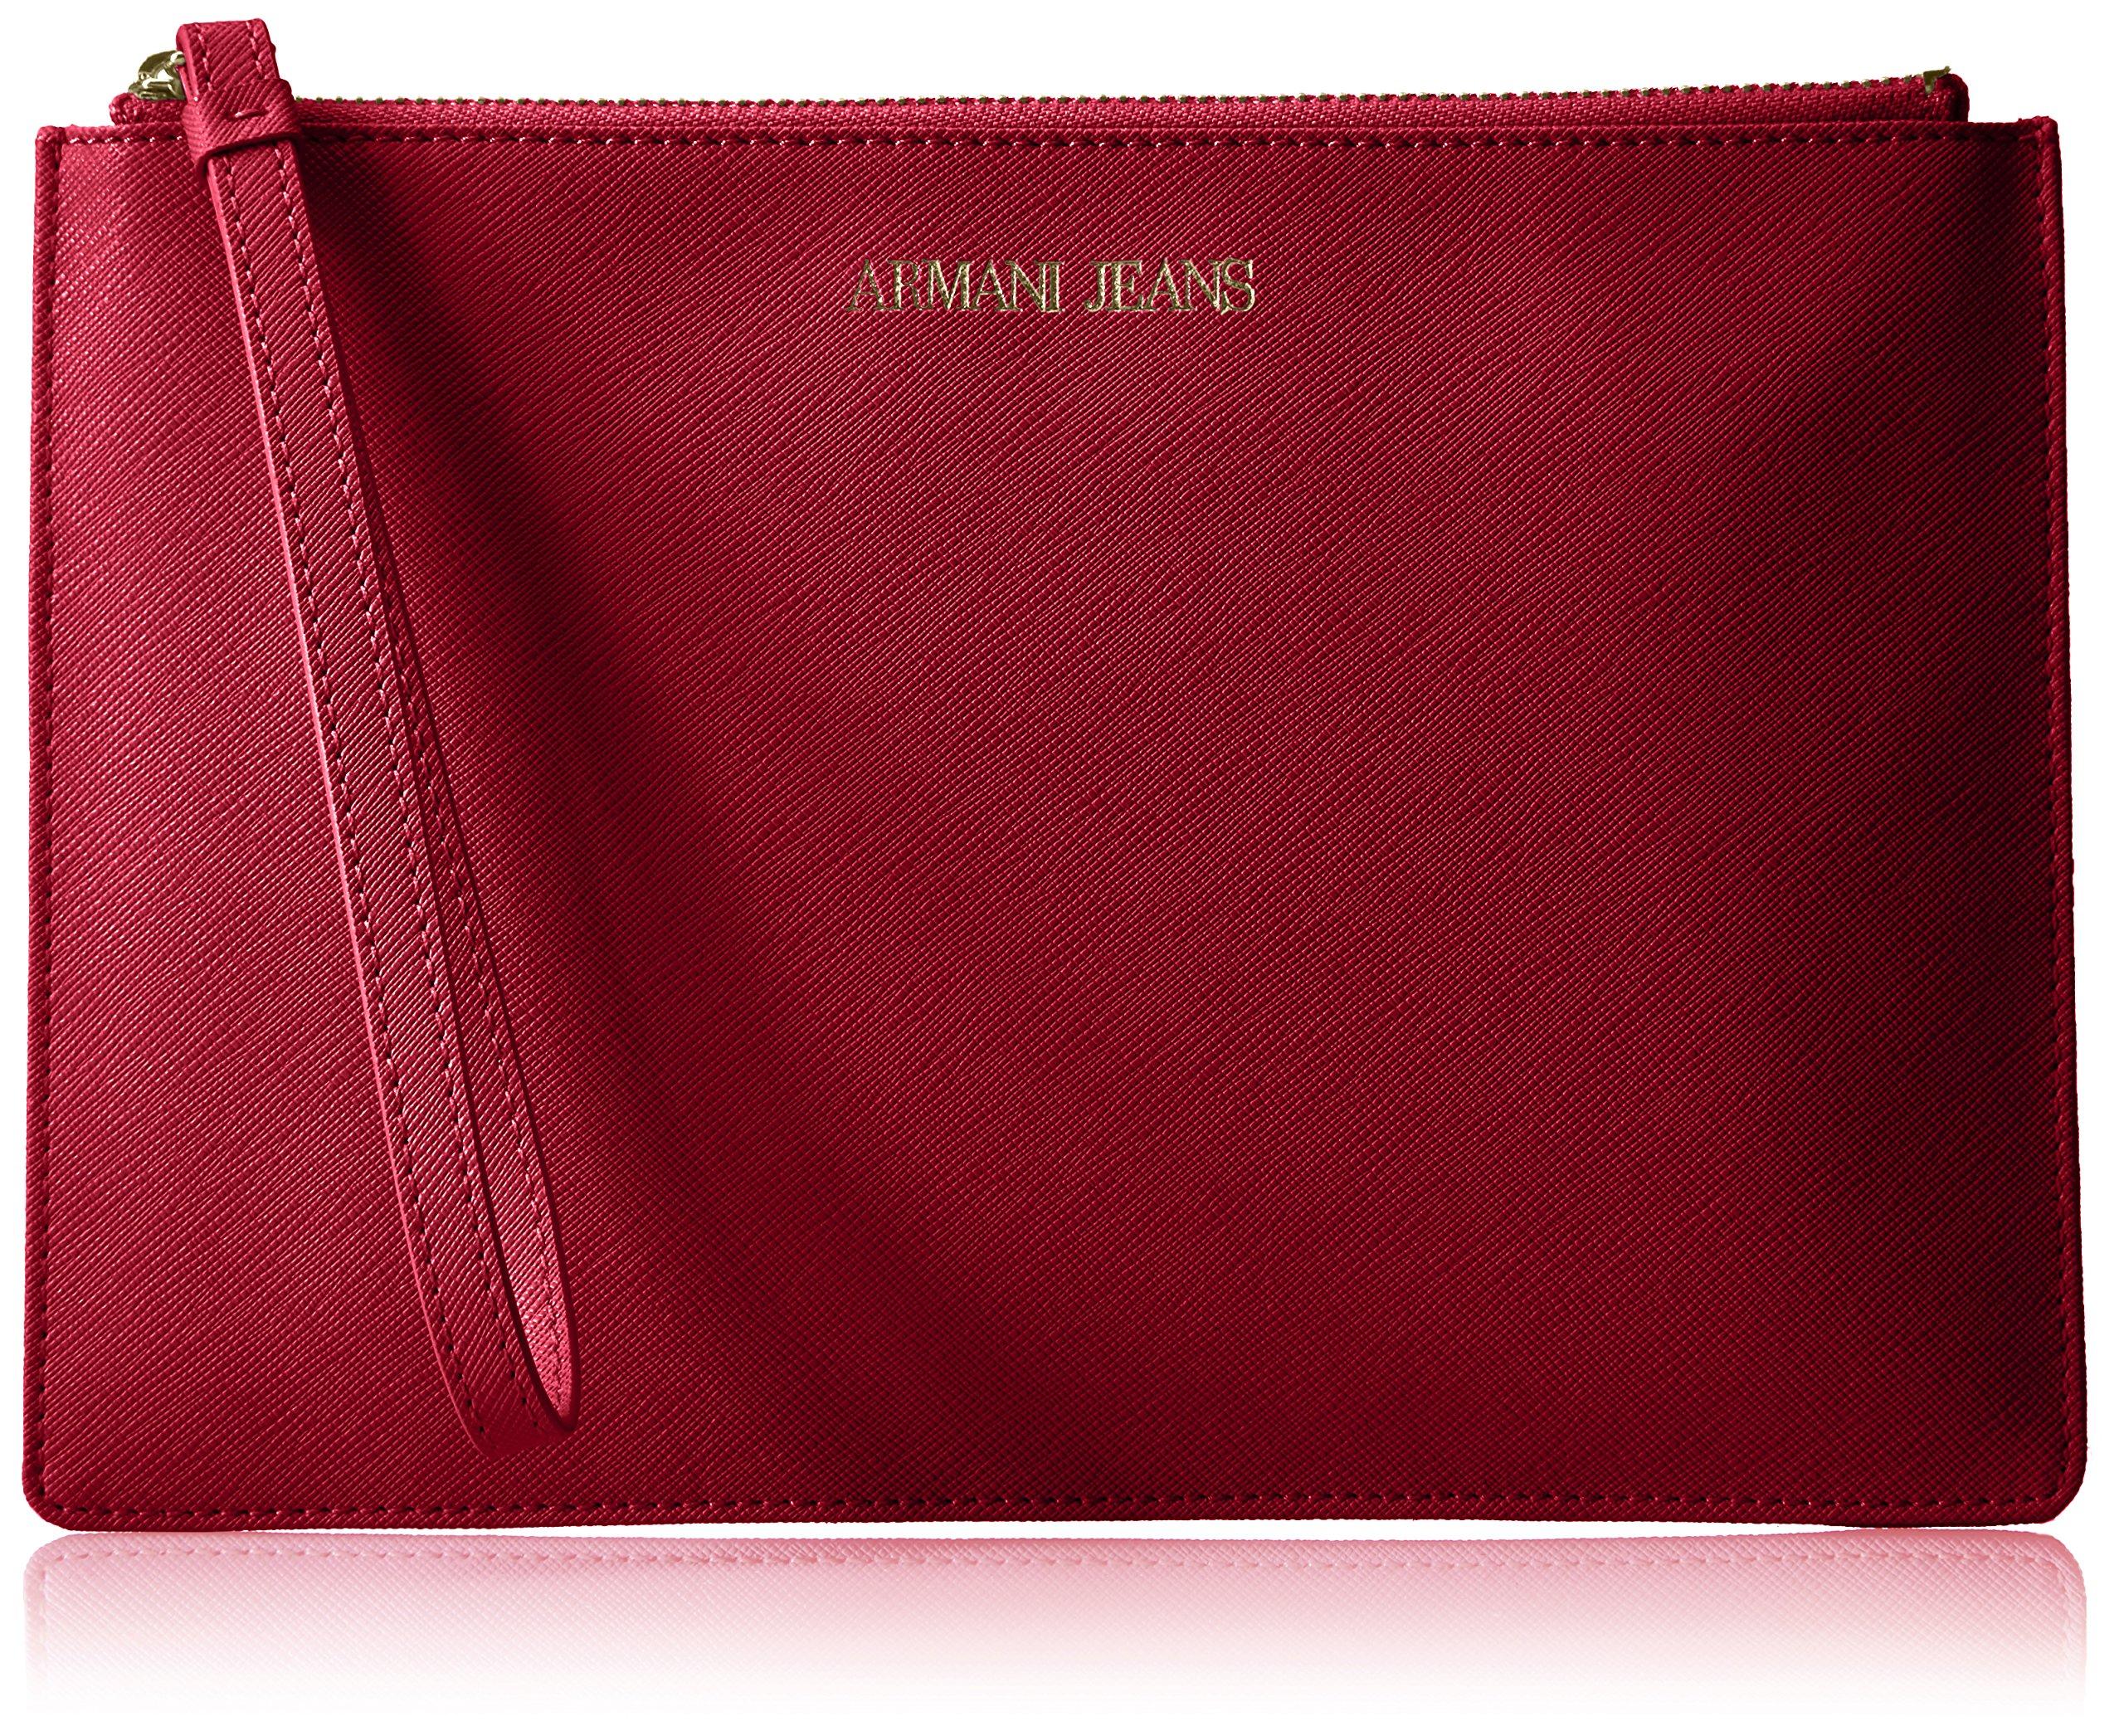 Armani Jeans Saffiano Crossbody Clutch, Berry by ARMANI JEANS